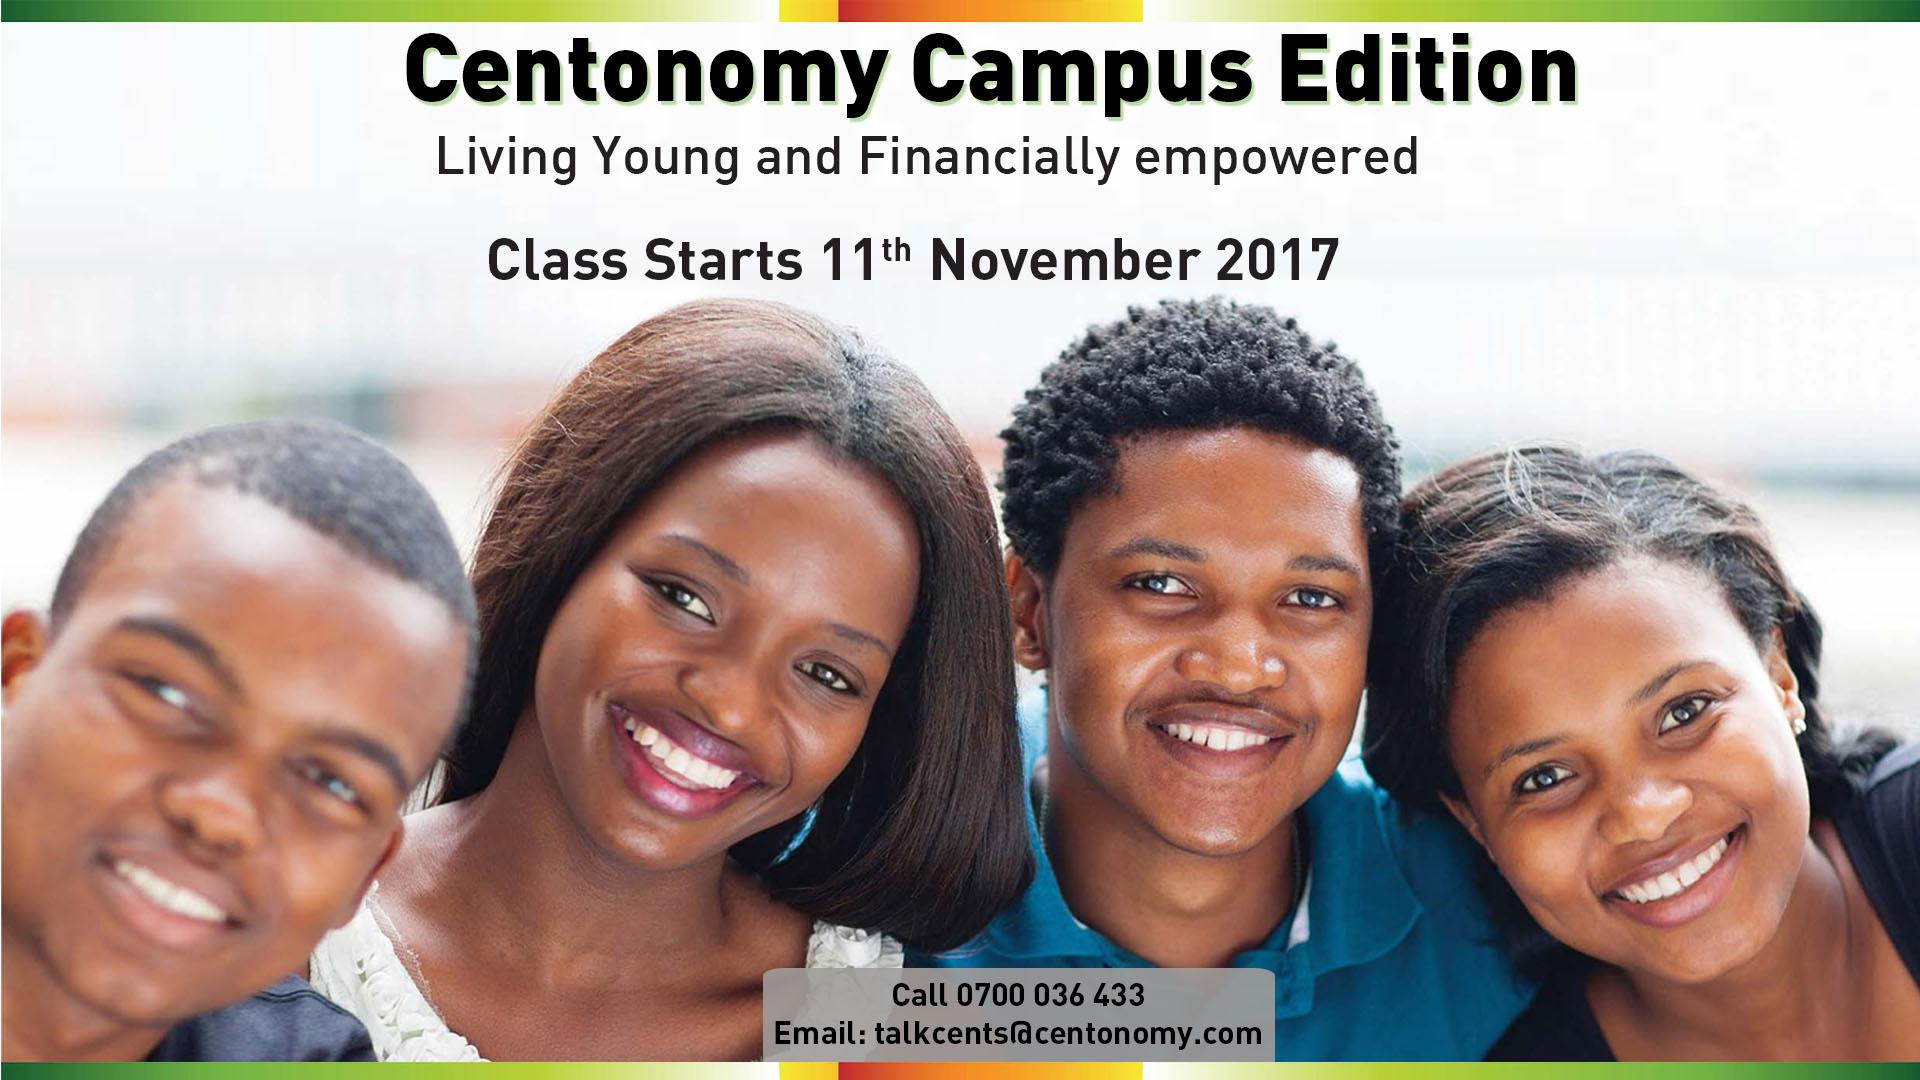 CENTONOMY CAMPUS EDITION